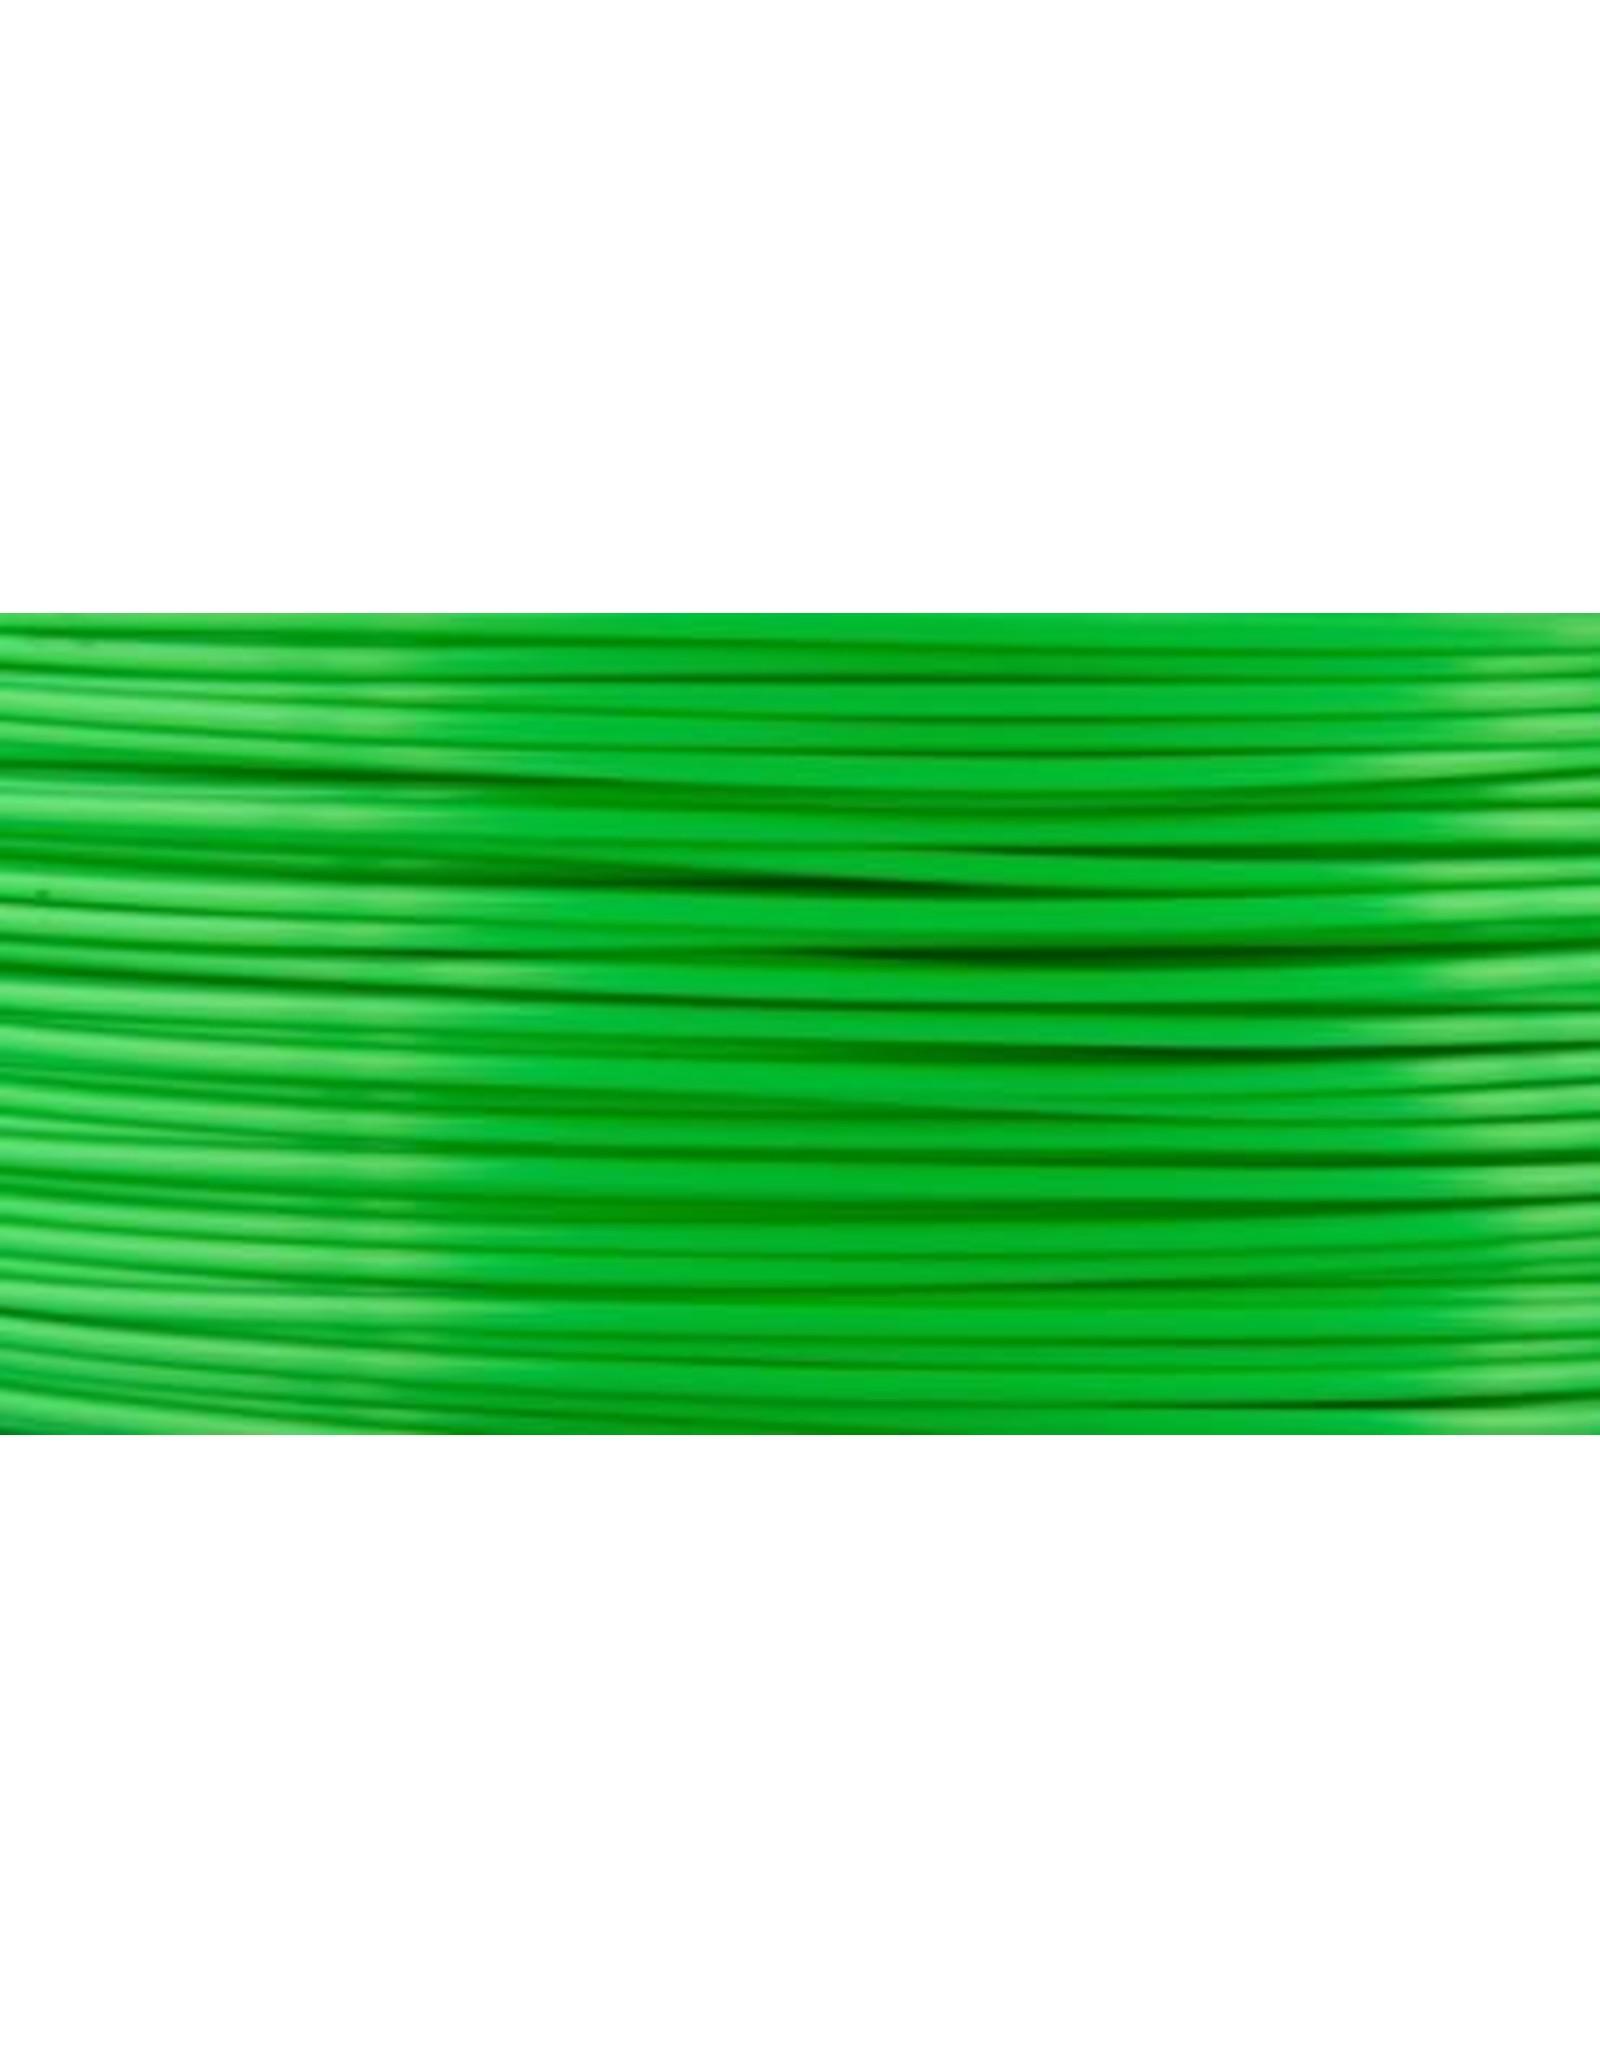 Prima PrimaSelect PLA Satin 1.75mm - 750gr Vert clair